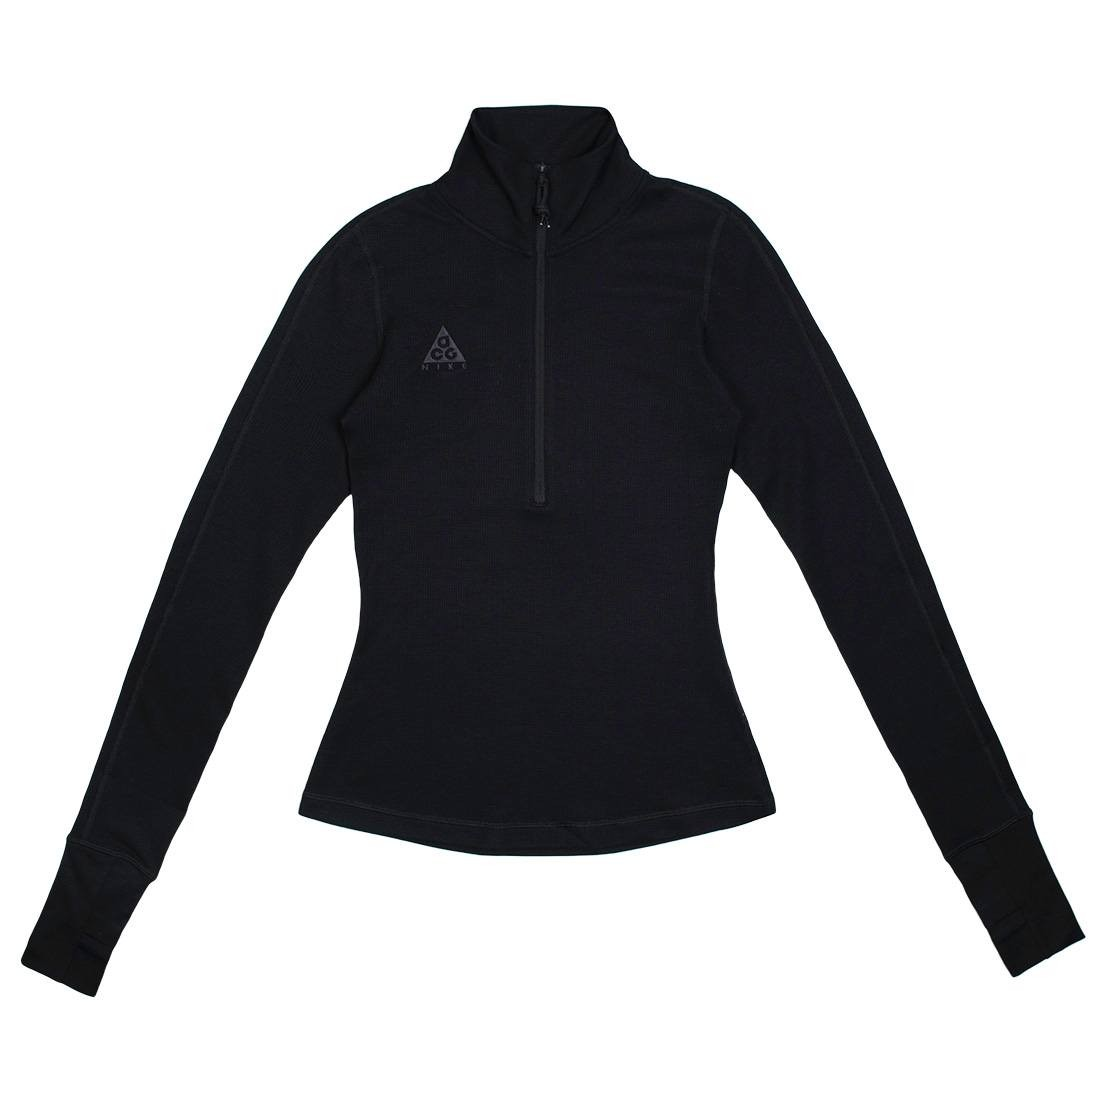 Nike Women Nrg Acg Thermal Long Sleeves Tee (black / anthracite)